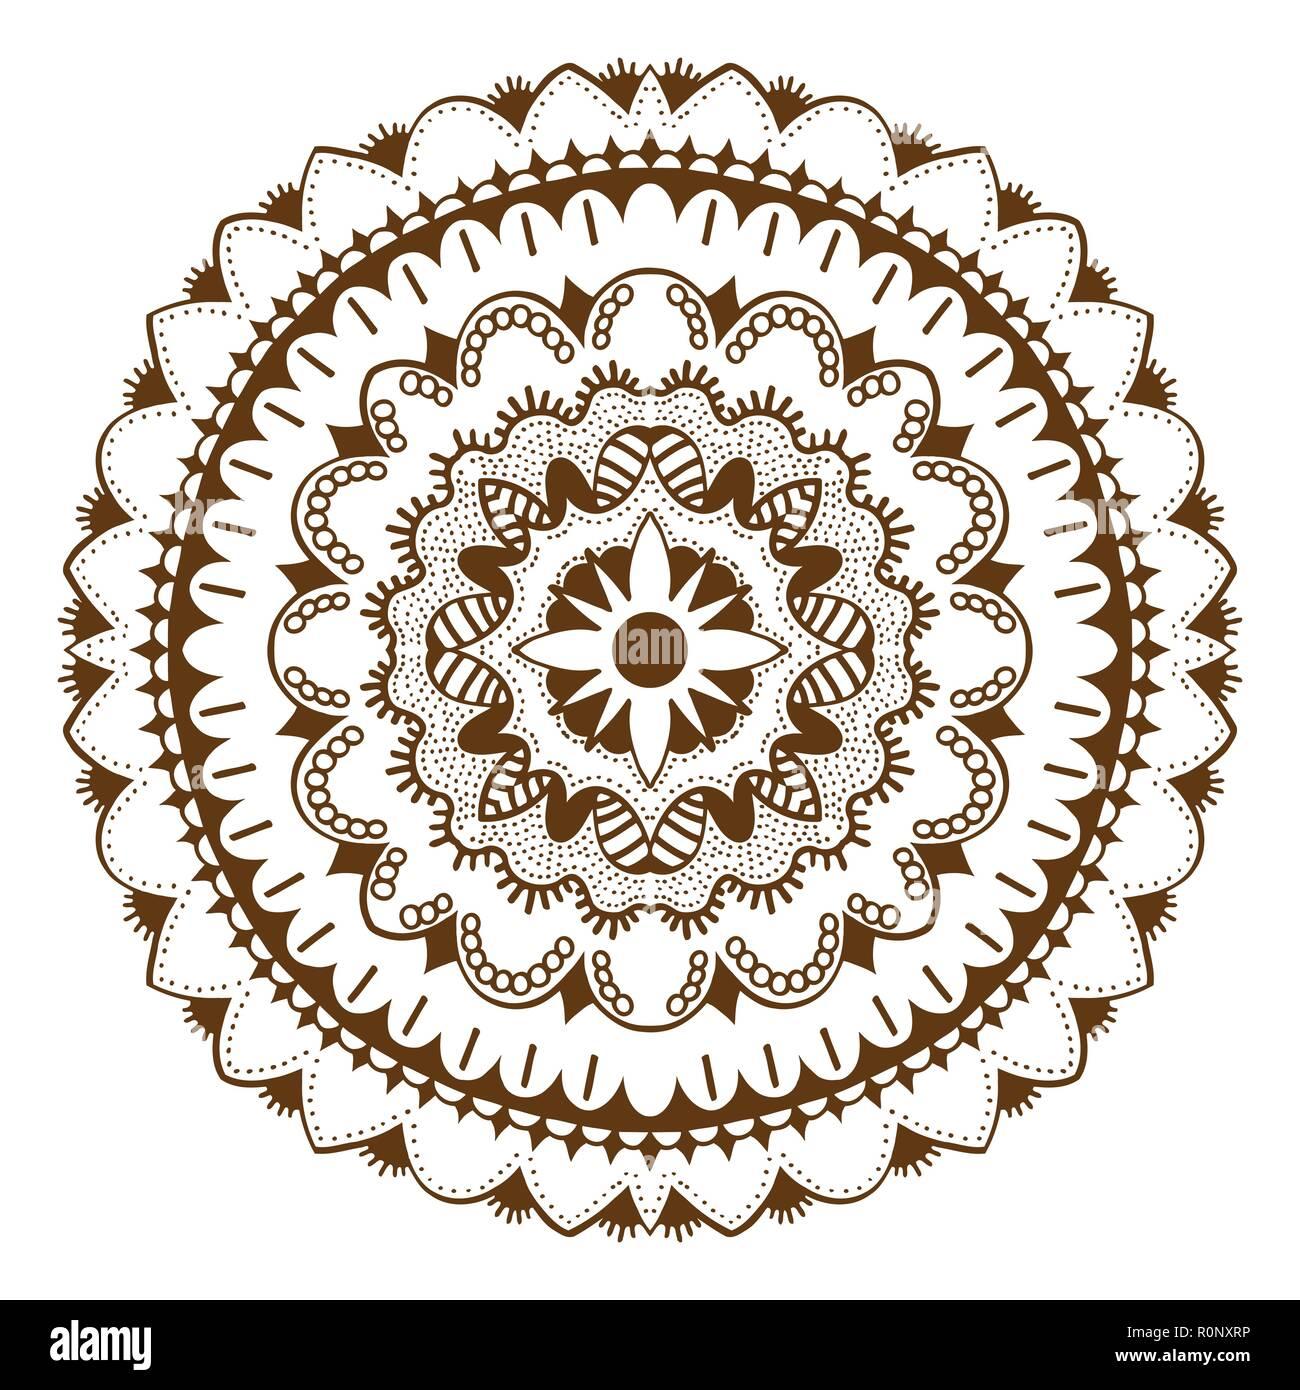 Abstrakte Floralen Ornament Mehndi Henna Tattoo Mandala Yantra